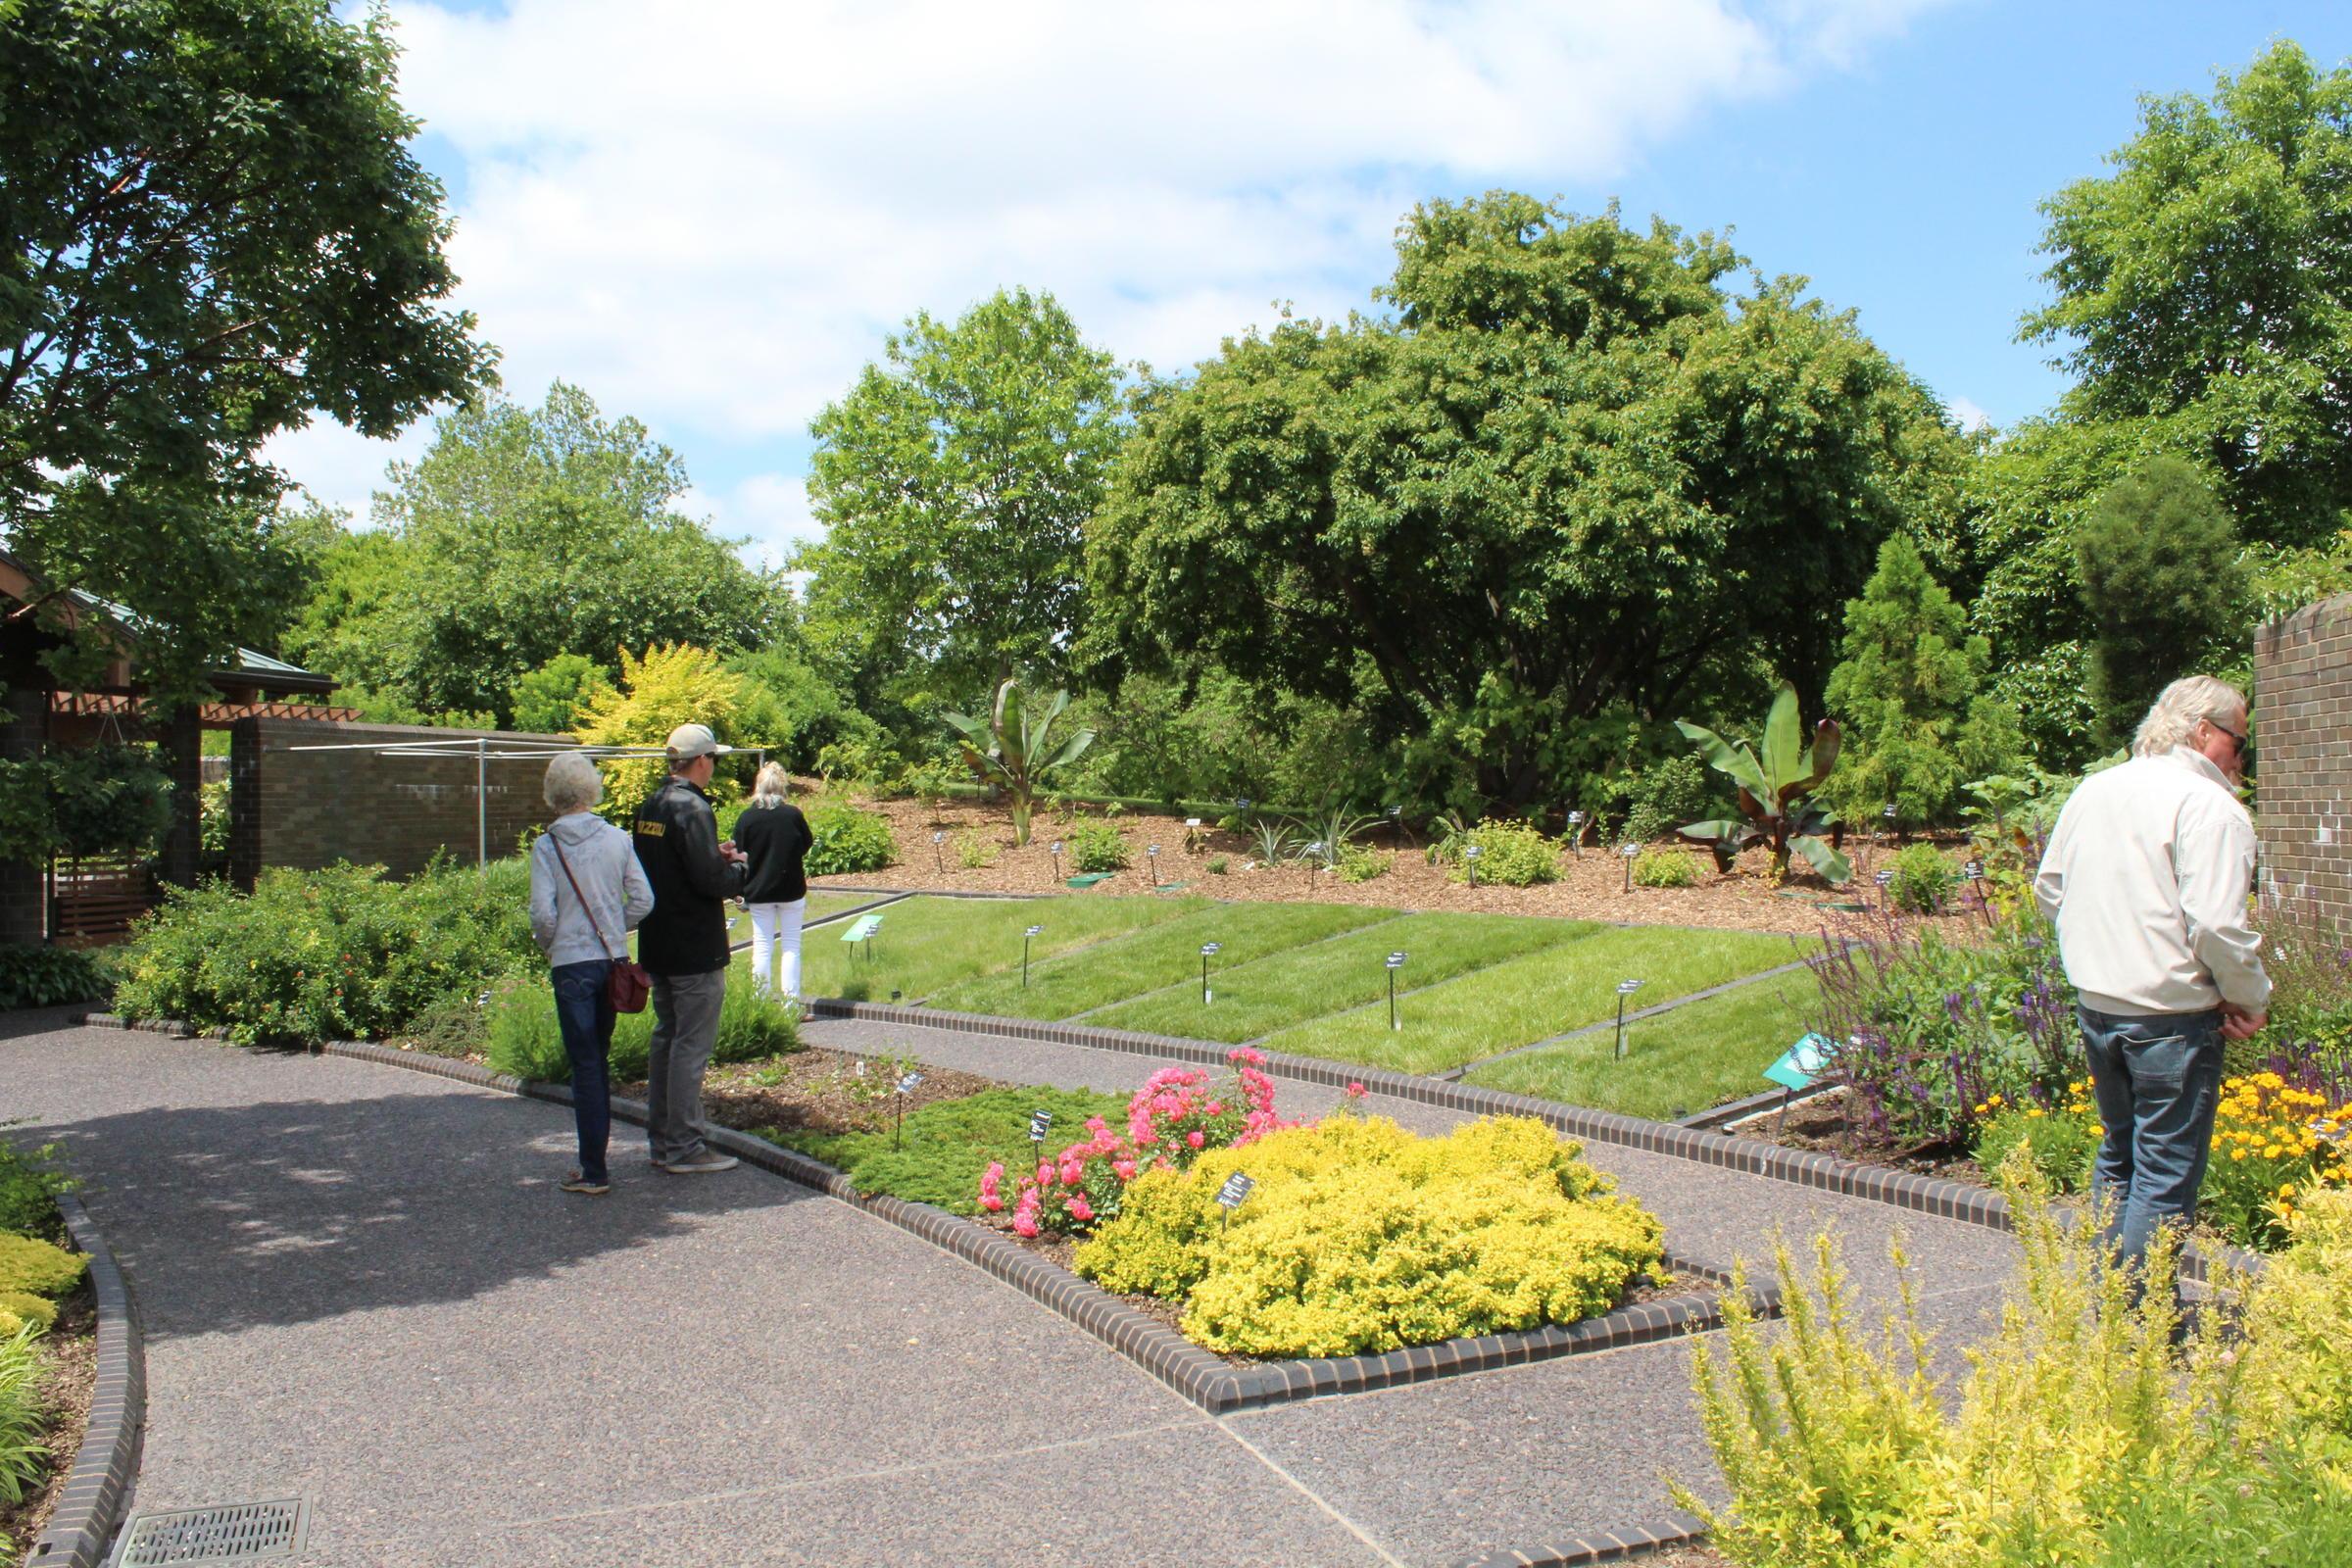 Local gardening hacks help green St Louis region